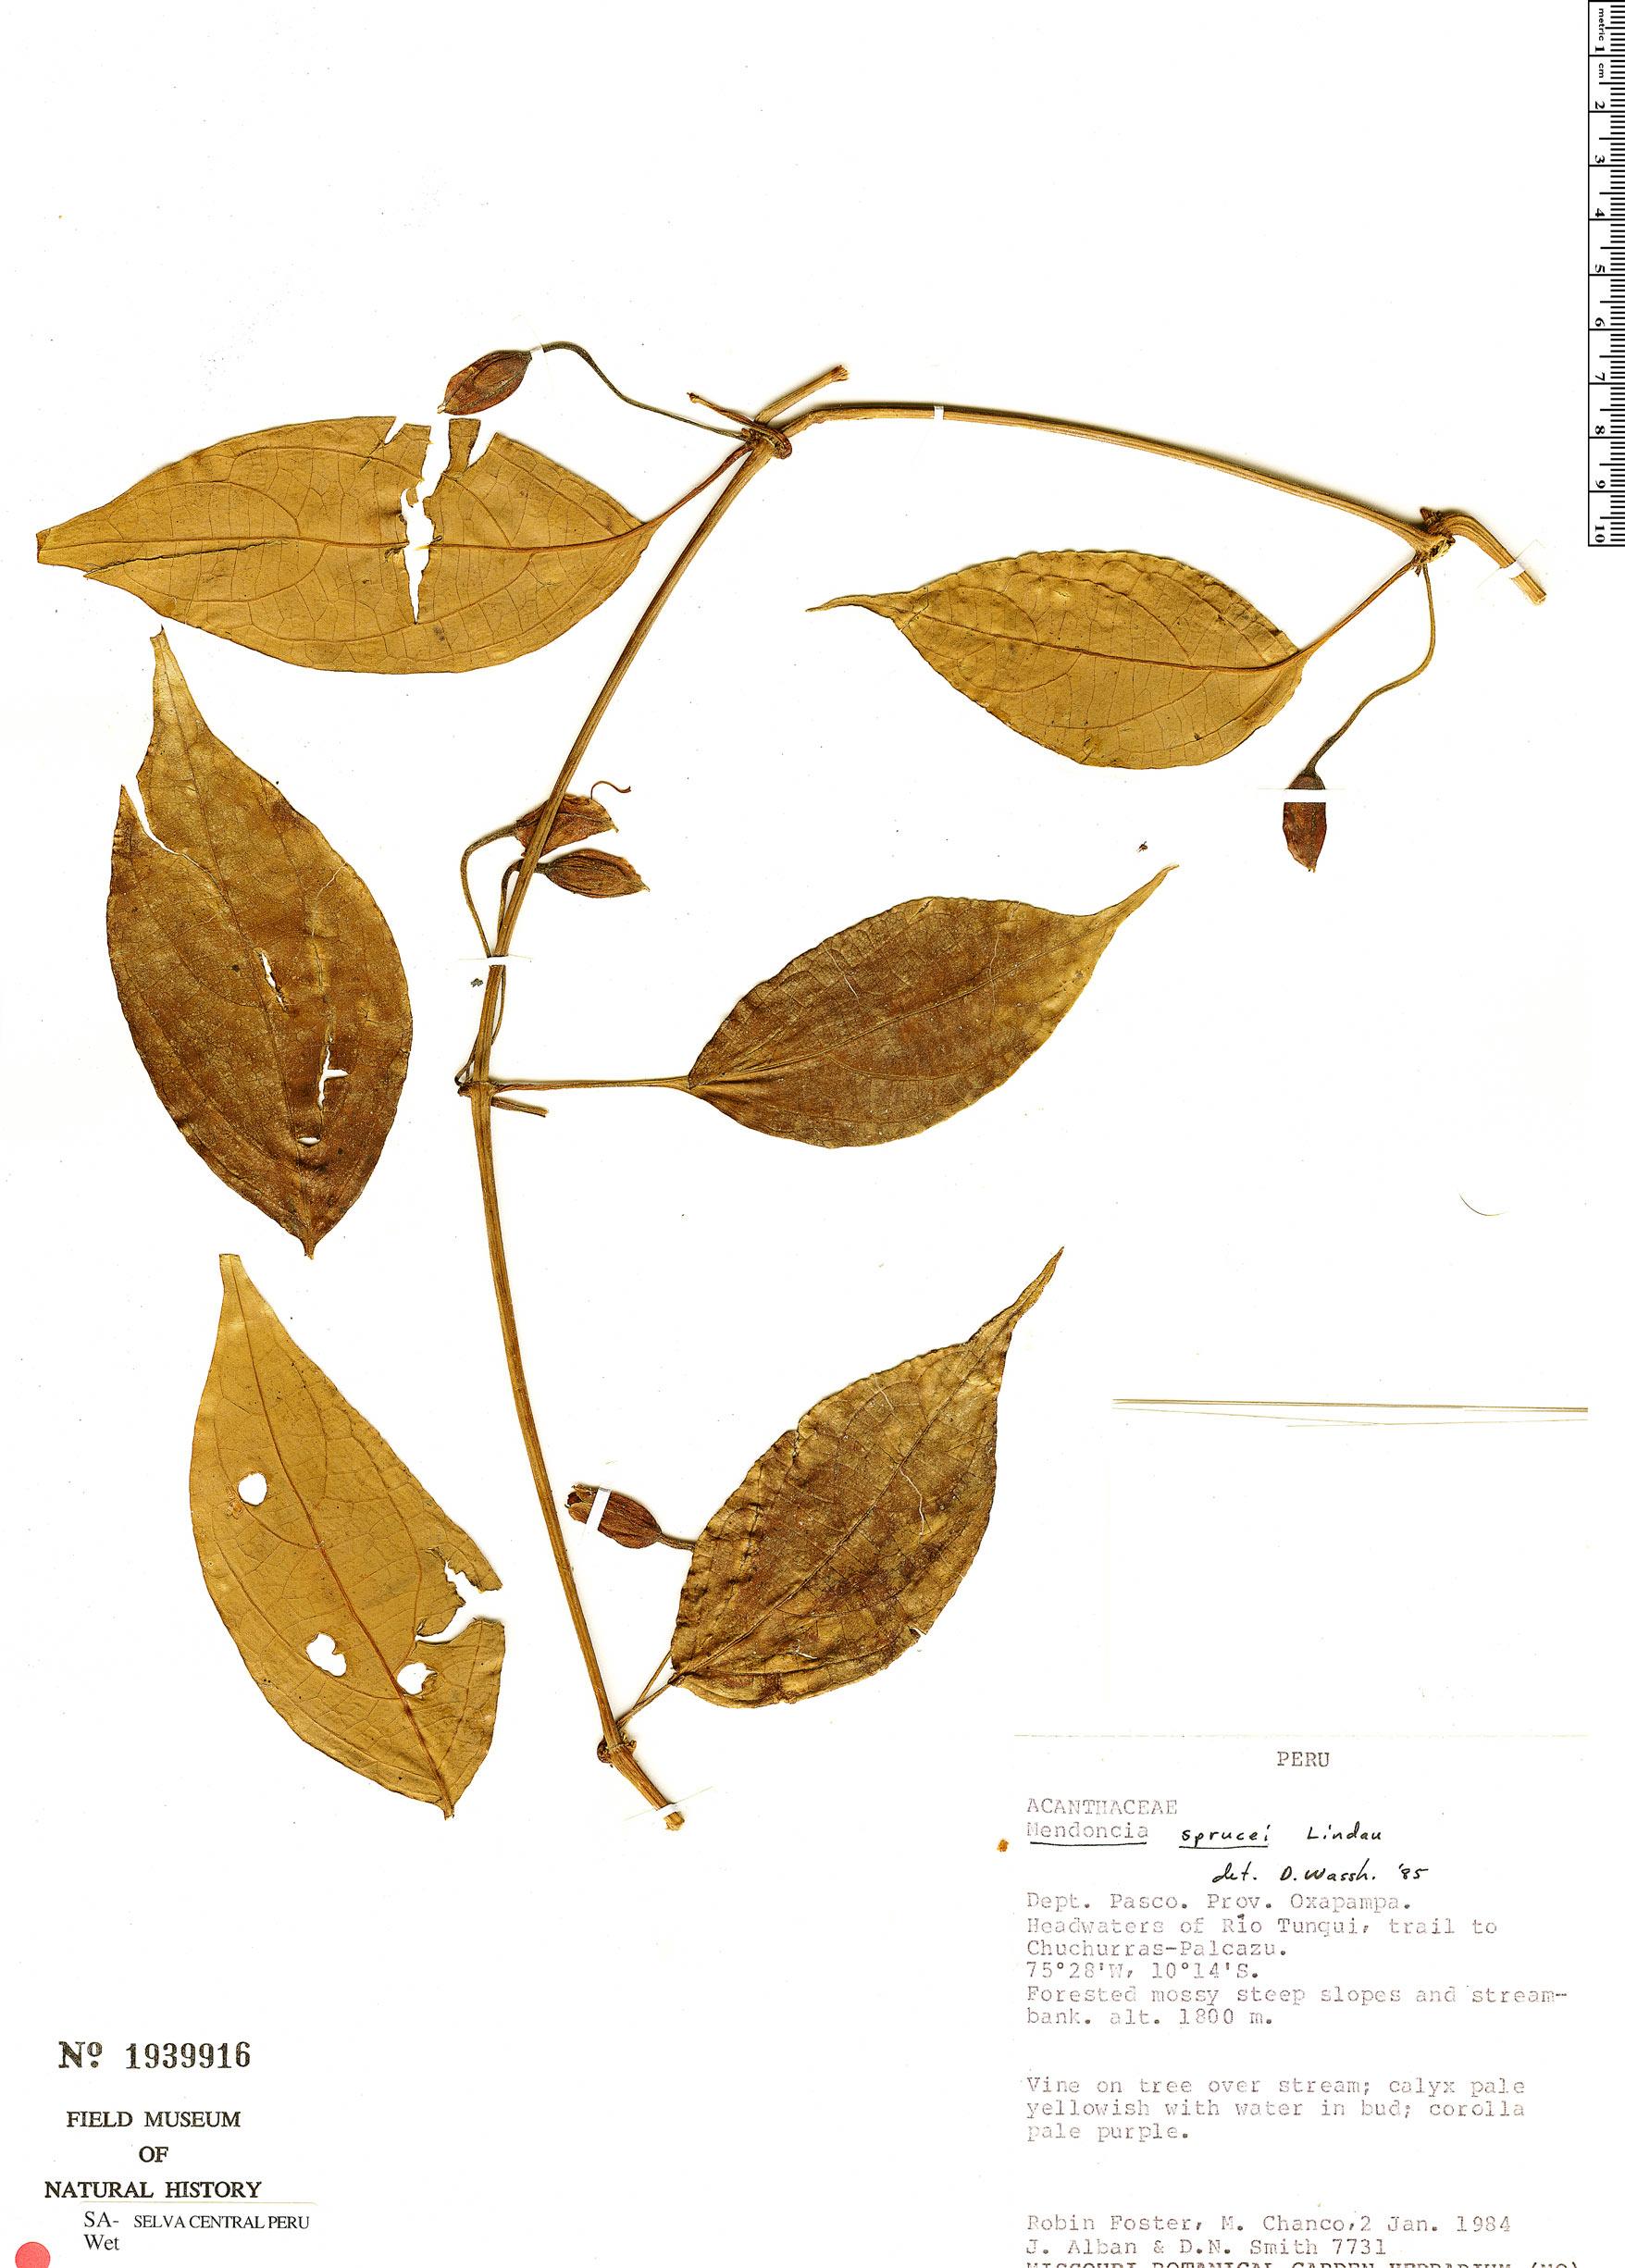 Specimen: Mendoncia sprucei